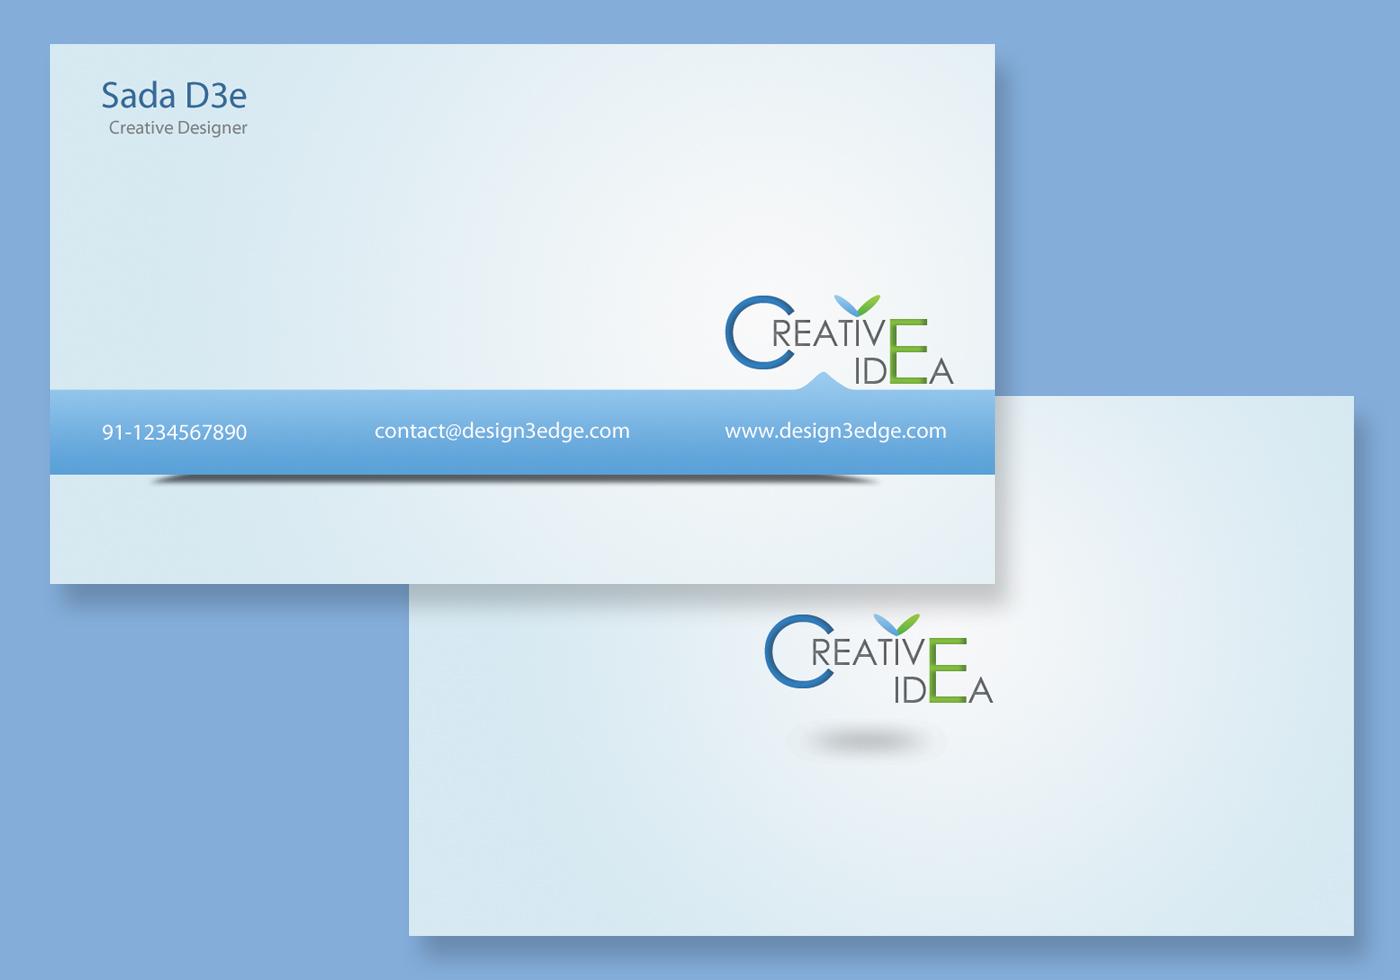 Modern-business-card-template-photoshop-psds